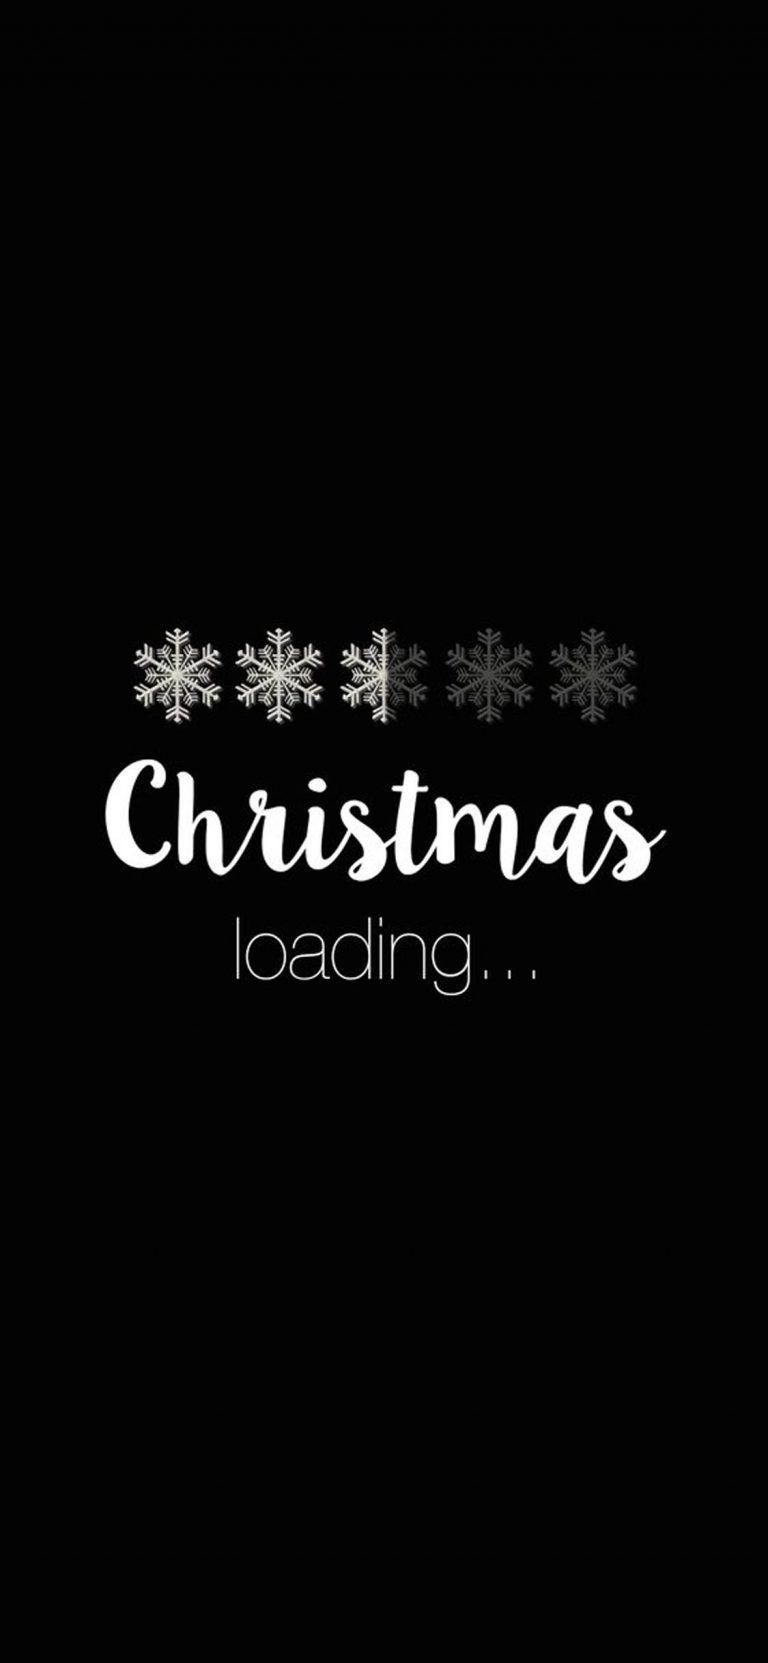 Iphone X Beautiful Wallpaper 1125 2436 Christmas Background Christmaswallpaperiphone Wallpaper Iphone Christmas Christmas Screen Savers Christmas Background